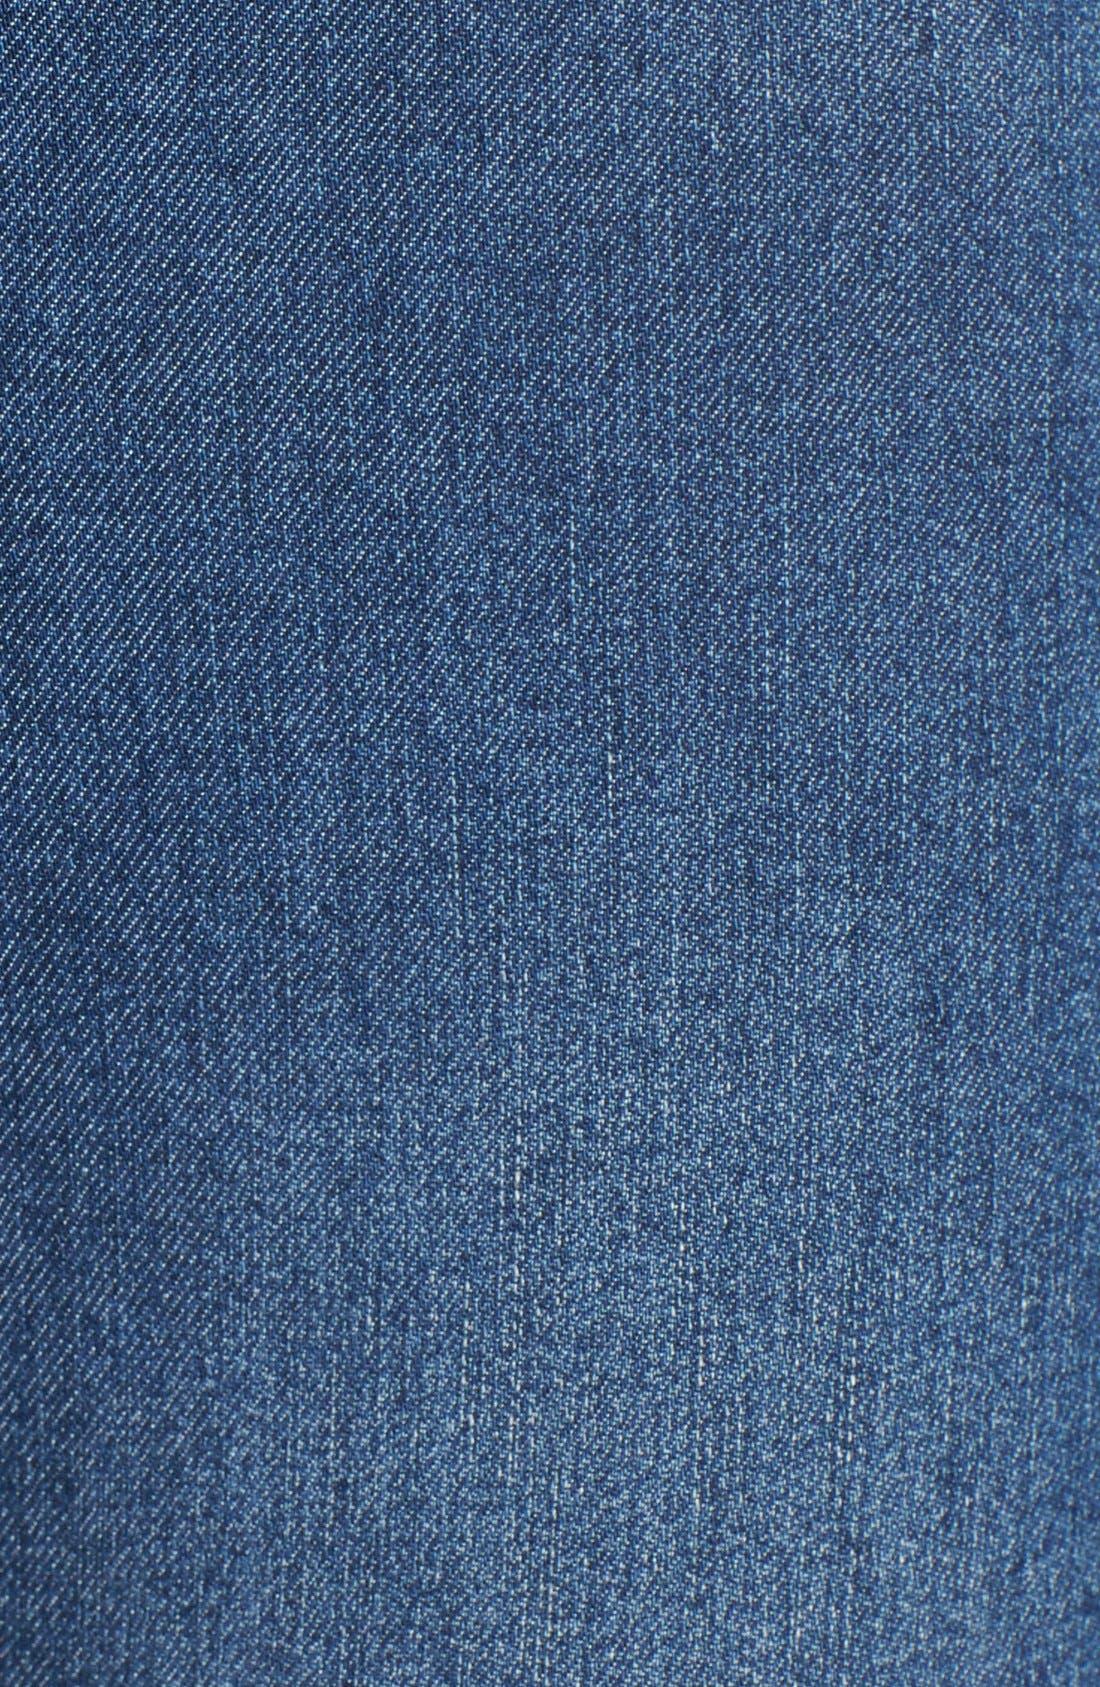 Alternate Image 5  - Cheap Monday 'High Spray' High Rise Skinny Jeans